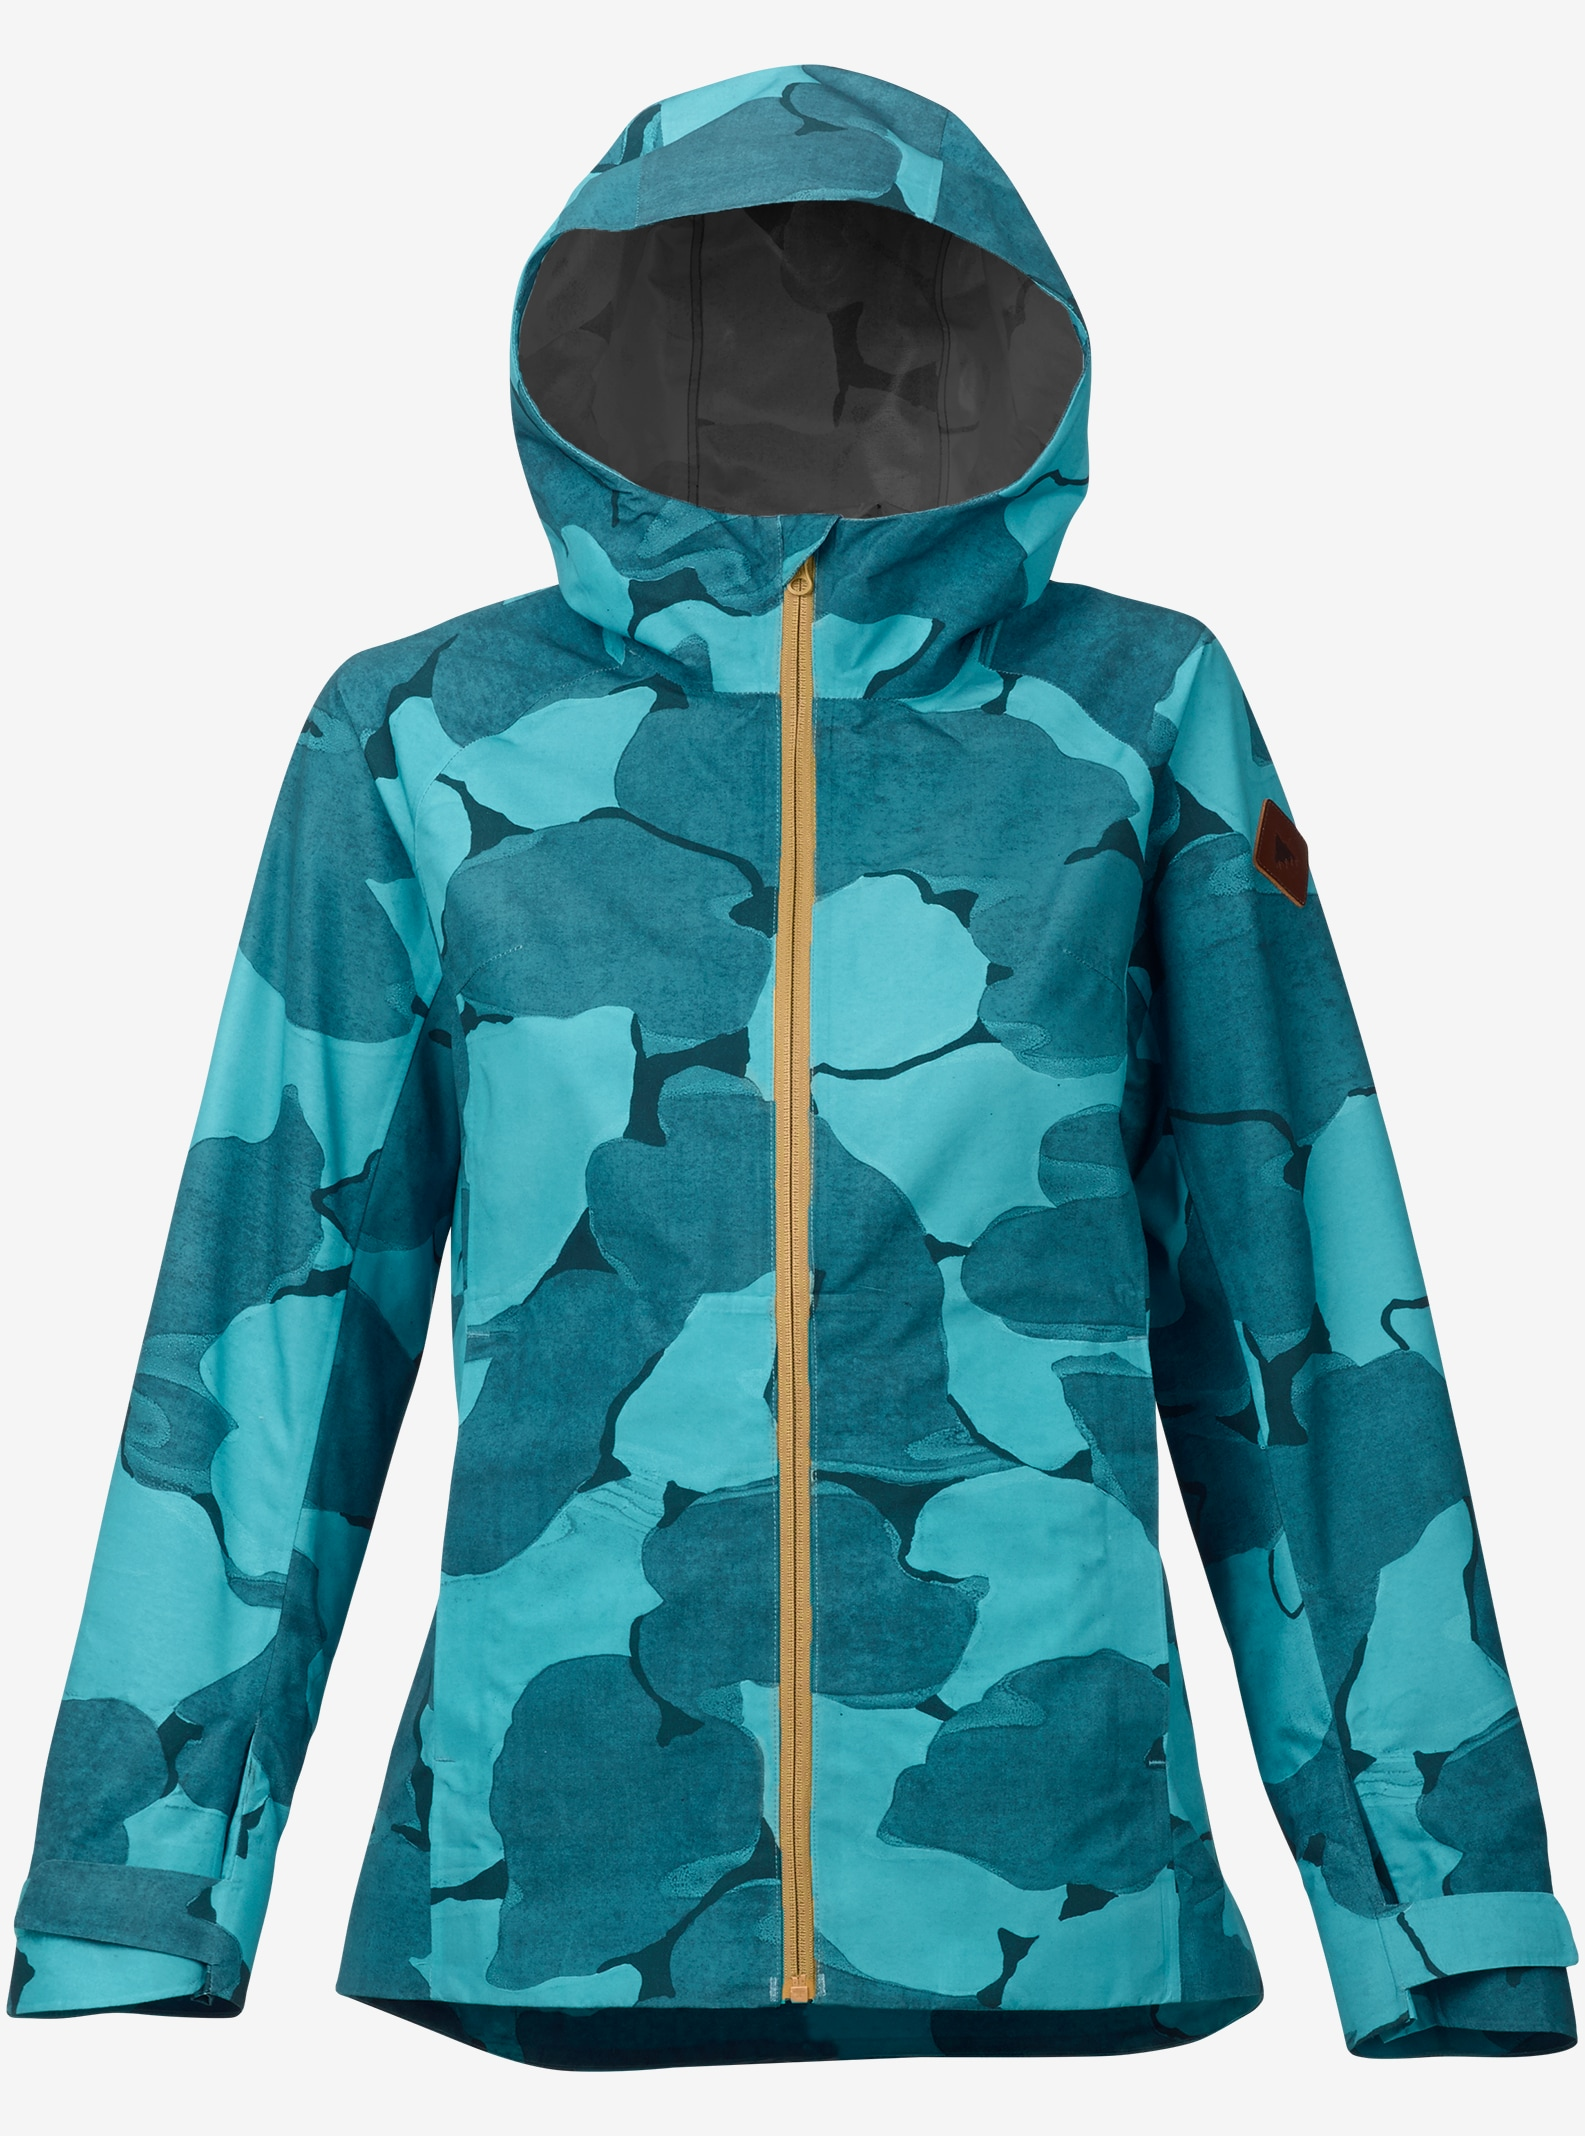 Burton GORE-TEX® 2L Day-Light Rain Jacket shown in Everglade Pond Camo